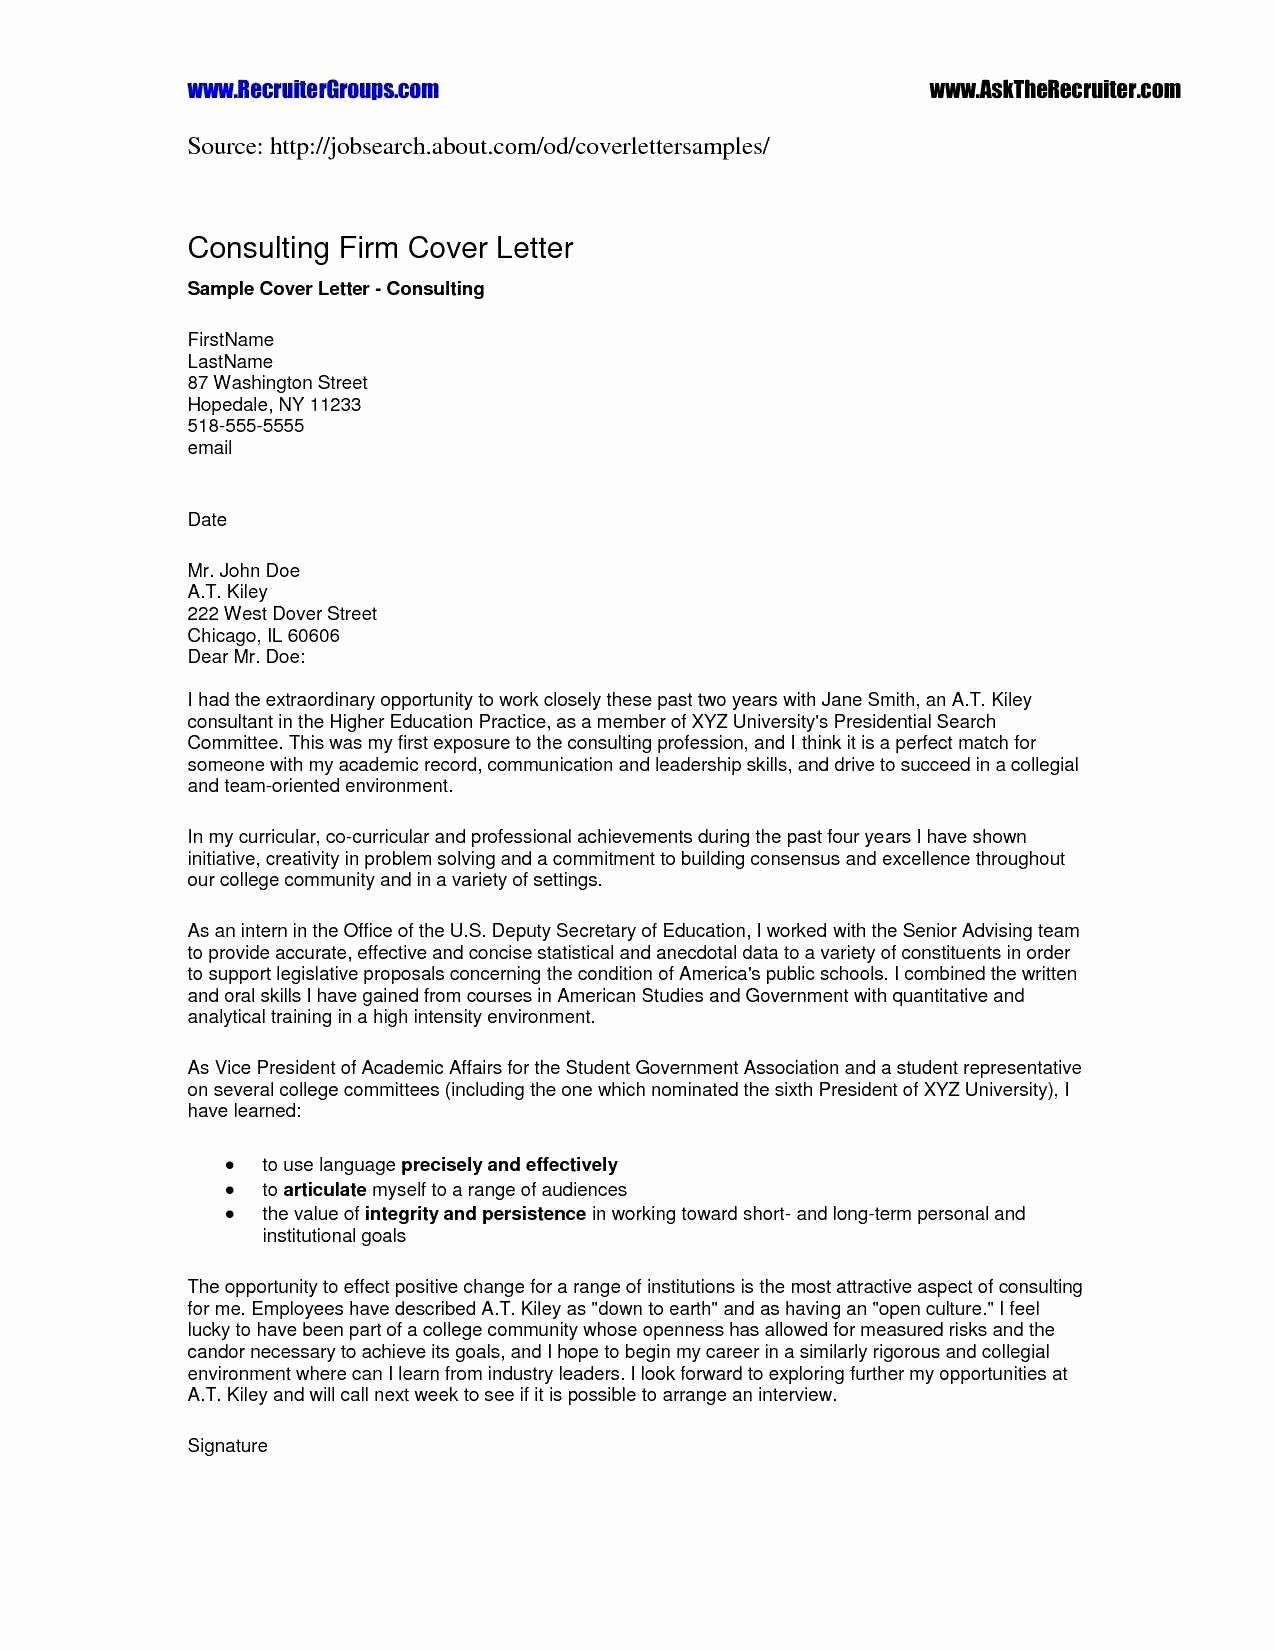 Contract Rescission Letter Fresh Rescission Letter for Timeshare 20 Beautiful Sample